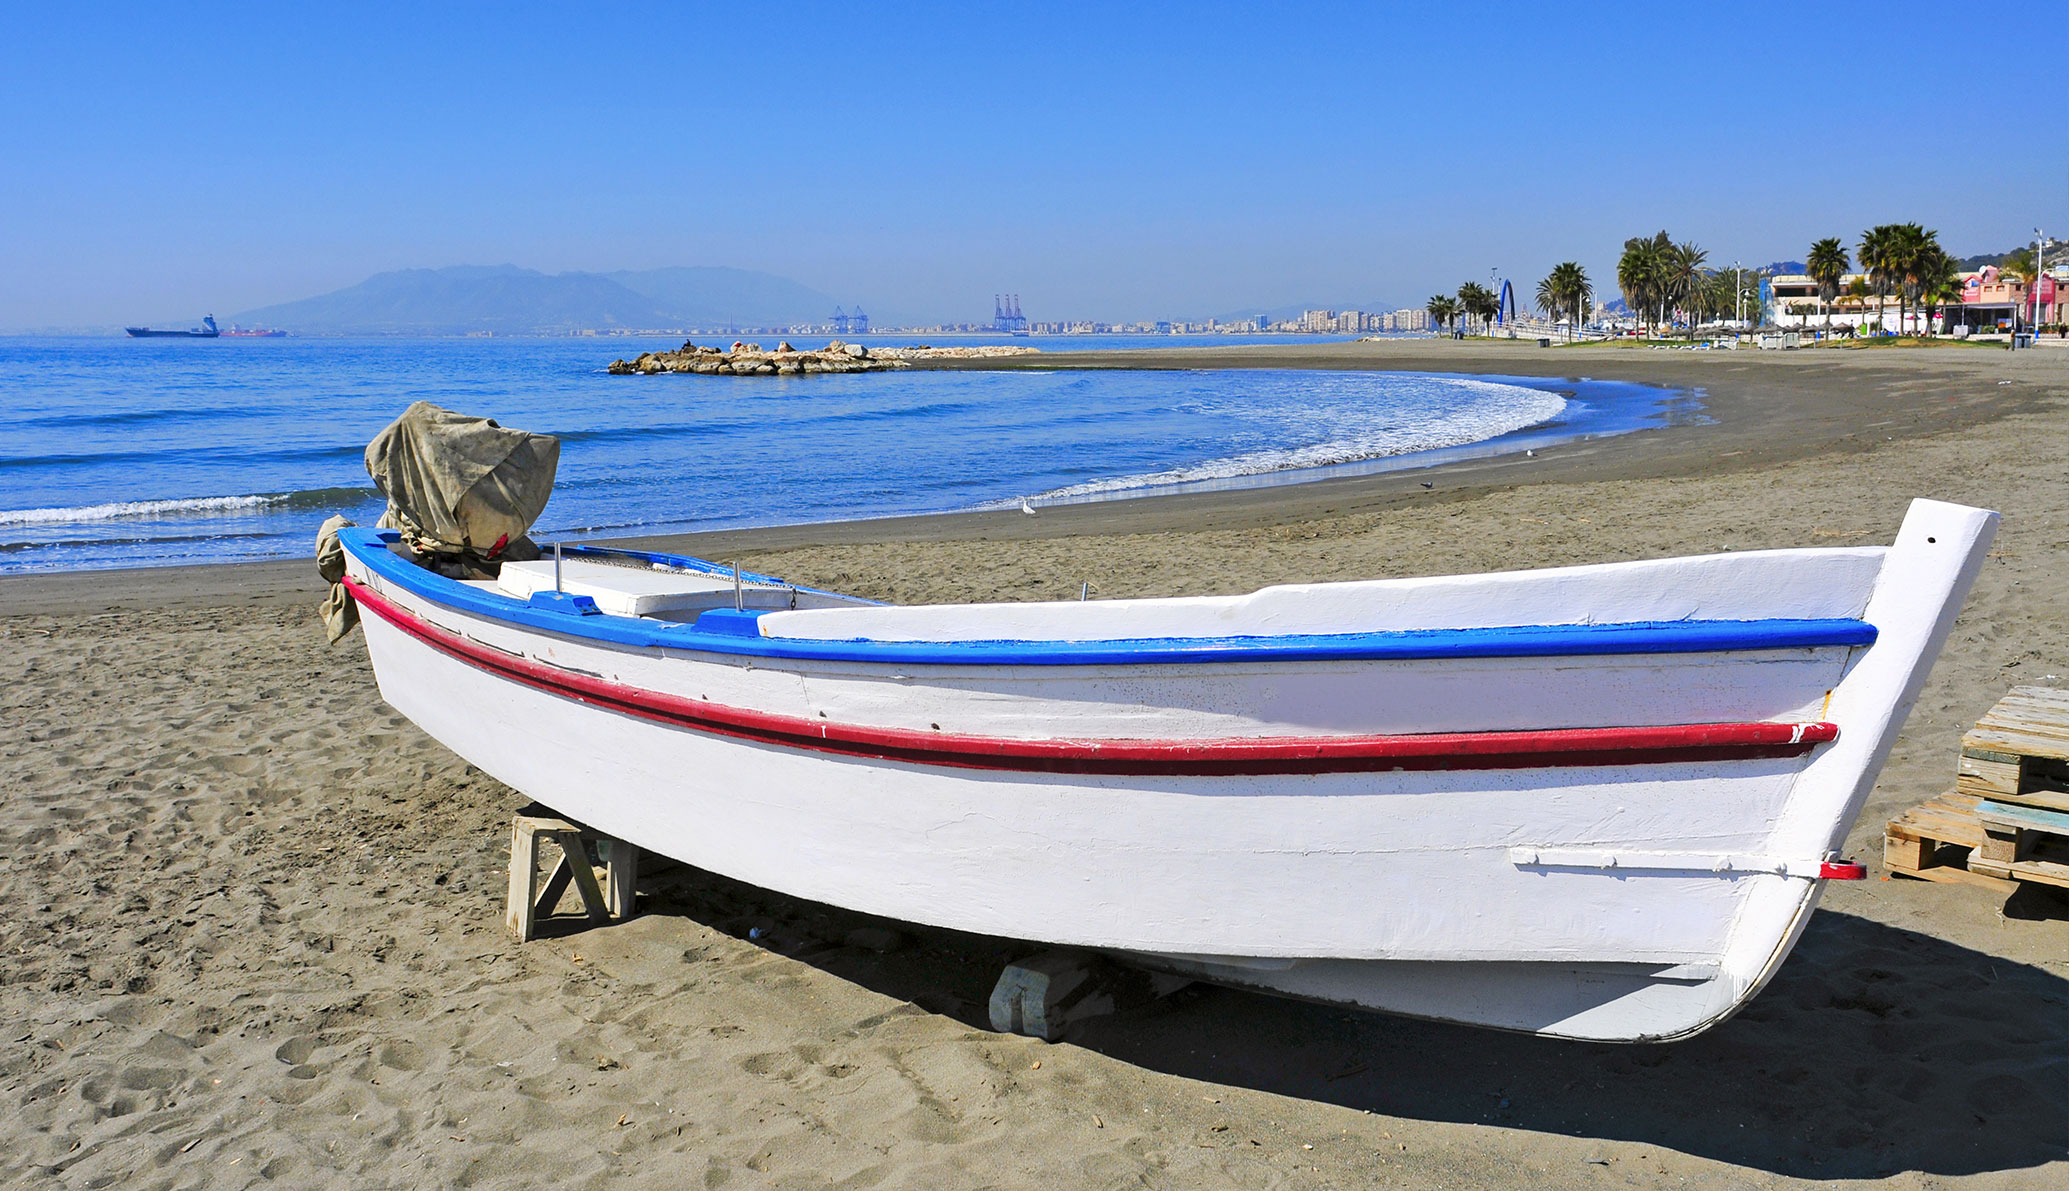 Blog de la Costa del Sol - Province de Málaga   Soleil et Plage